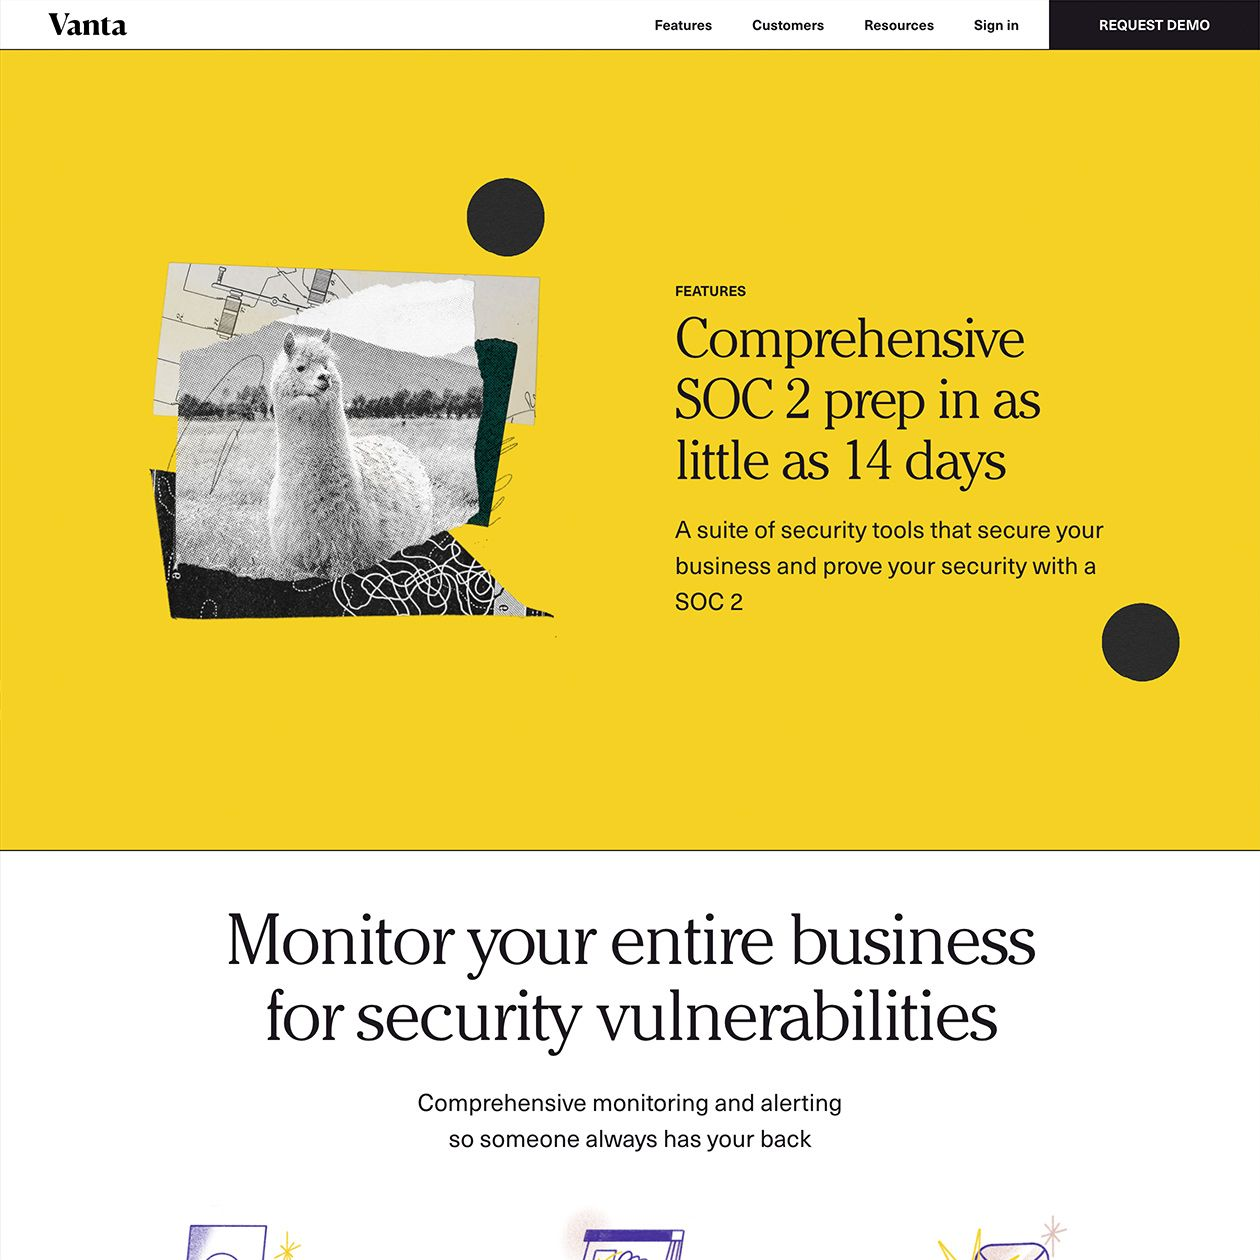 Vanta Typewolf In 2020 Security Tools Interactive Design Web Design